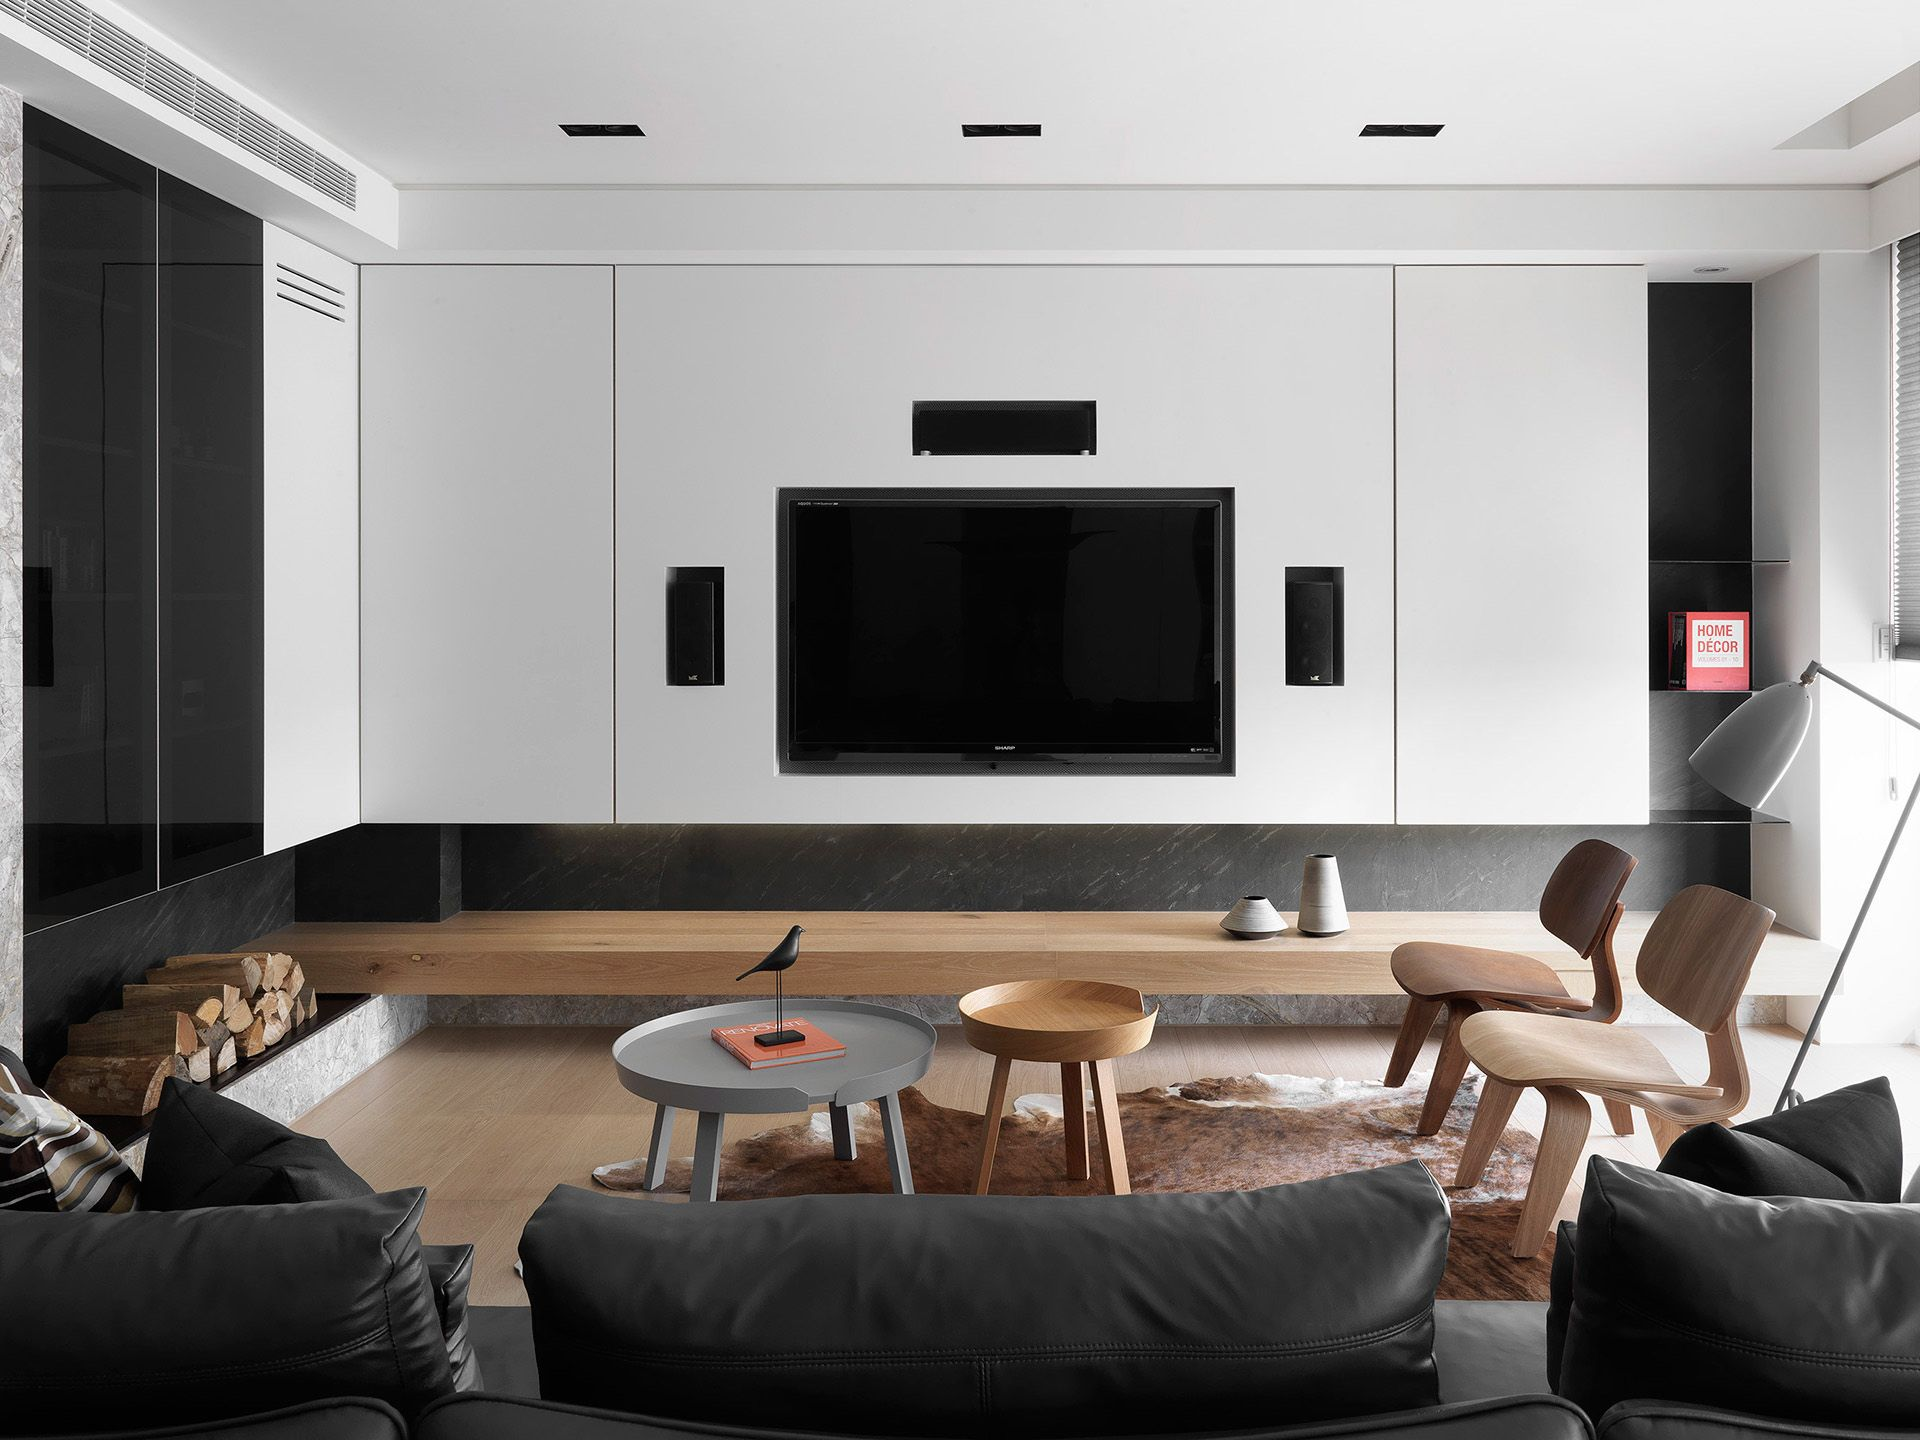 HOME DECOR: Living Room CNC Wood Designs Will Blow Your Mind   decoracion    Pinterest   Cnc wood, Wood design and CNC